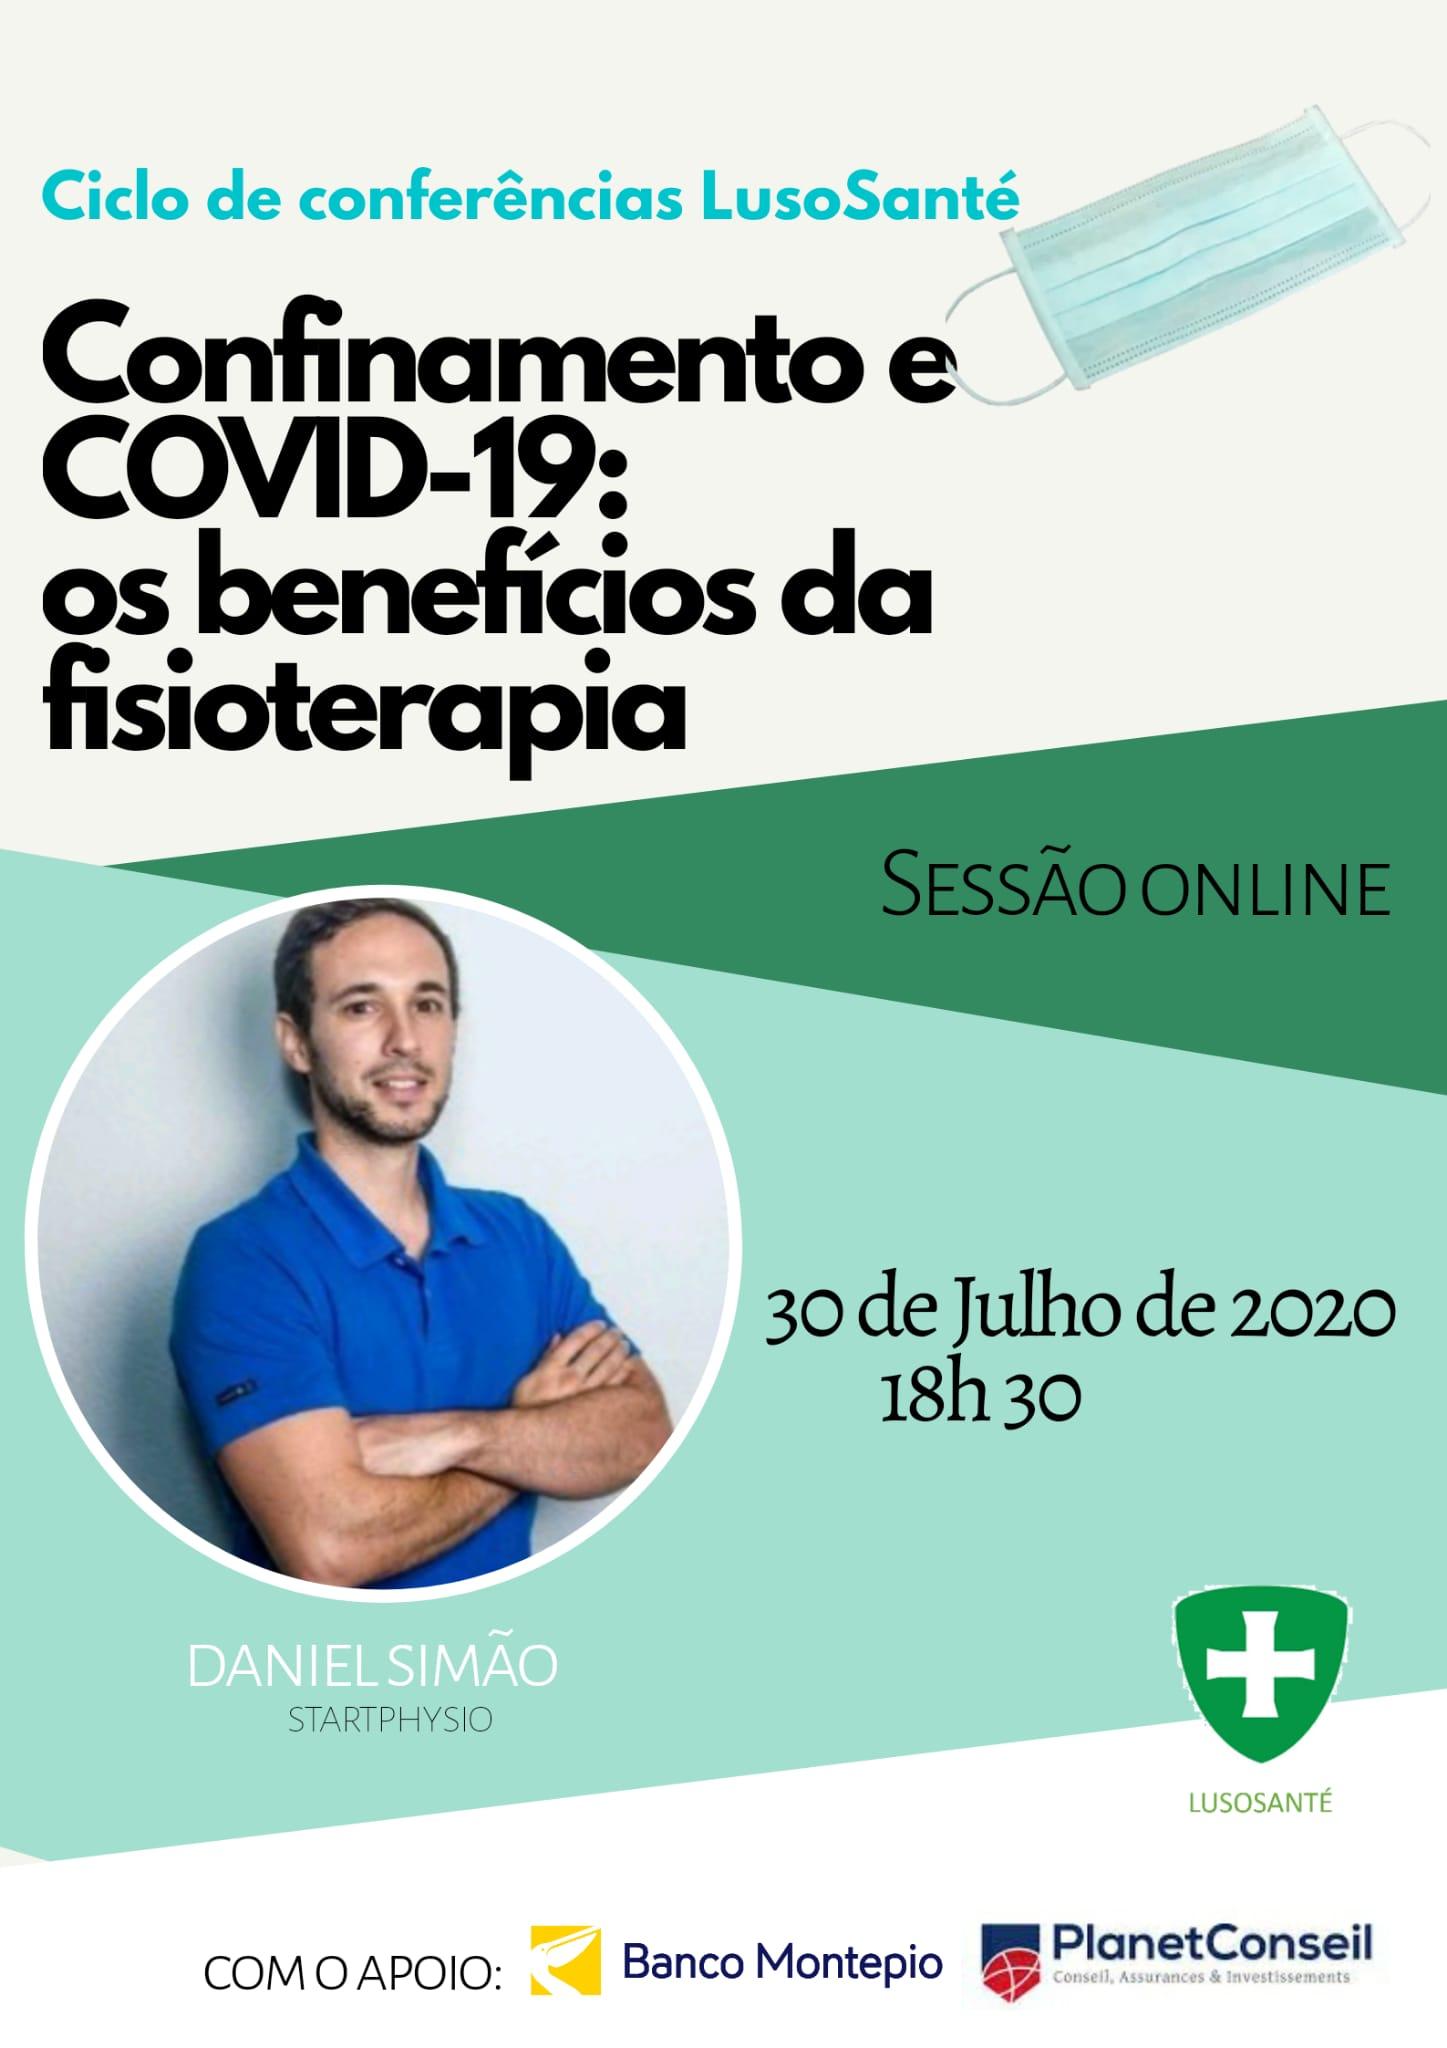 3a Conferência LusoSanté